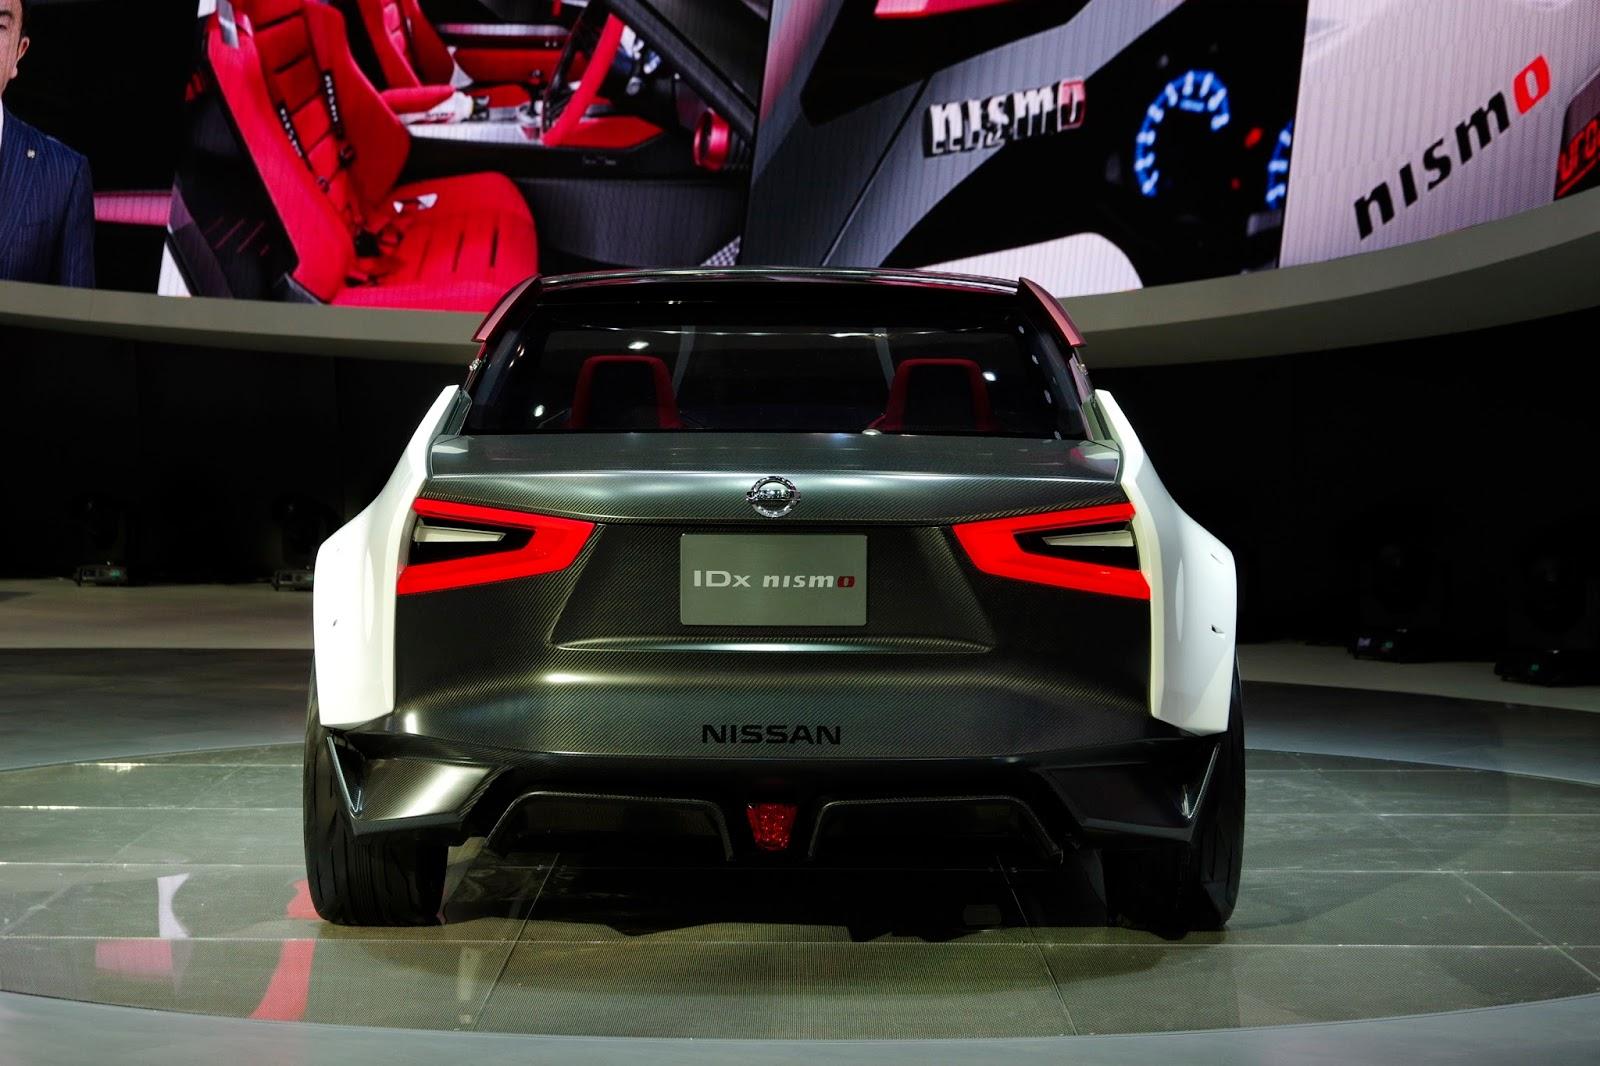 nissan idx nismo concept 05 Το επόμενο Nissan Z θα είναι ελαφρύτερο, μικρότερο και δίλιτρο